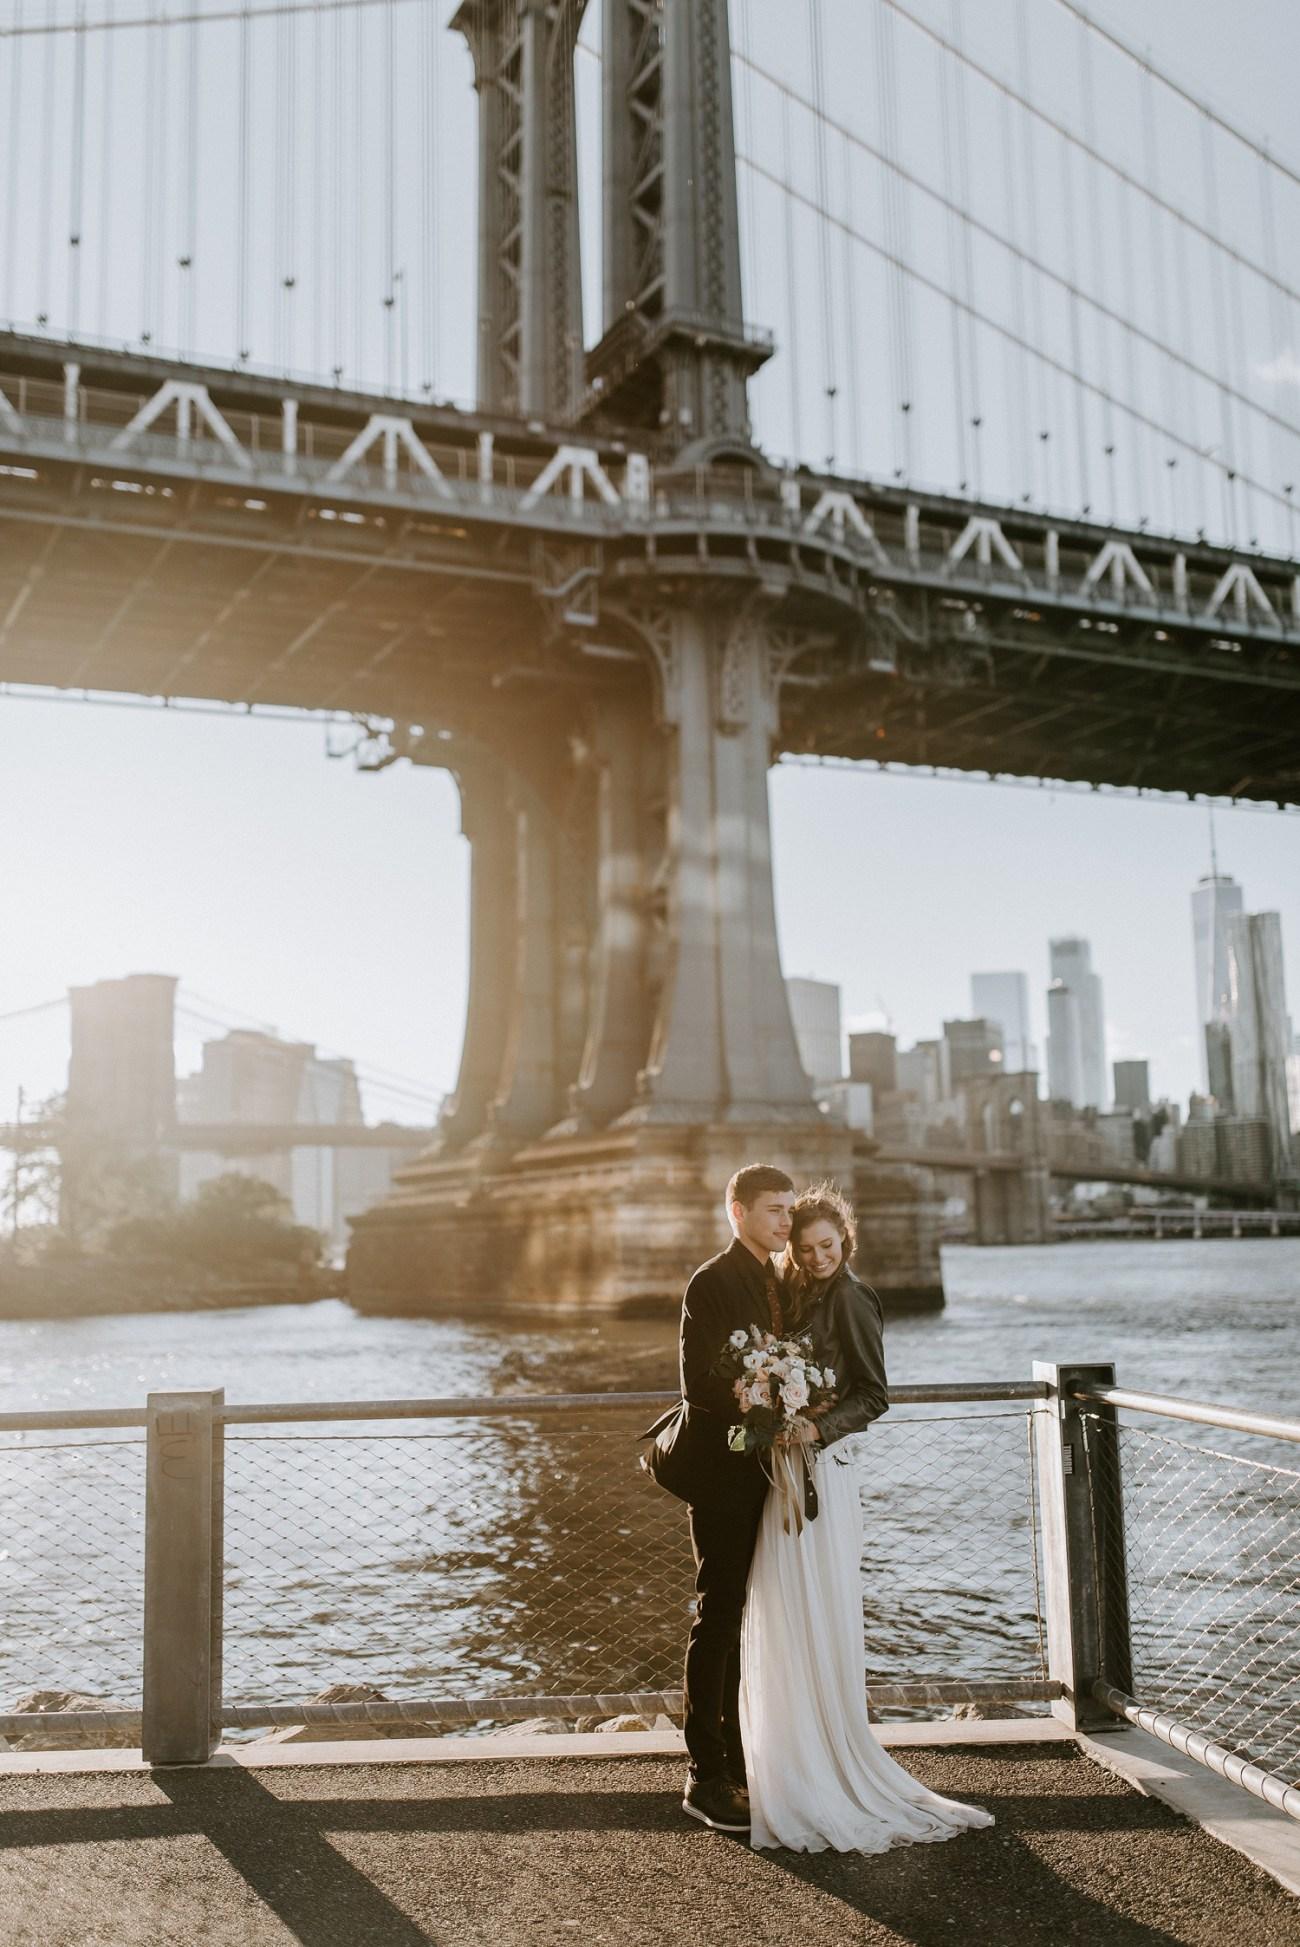 Brooklyn Dumbo sunset elopement by the Manhattan Bridge. Anais Possamai Photography, New York wedding photographer. Brooklyn elopement photographer, NYC elopement photographer.